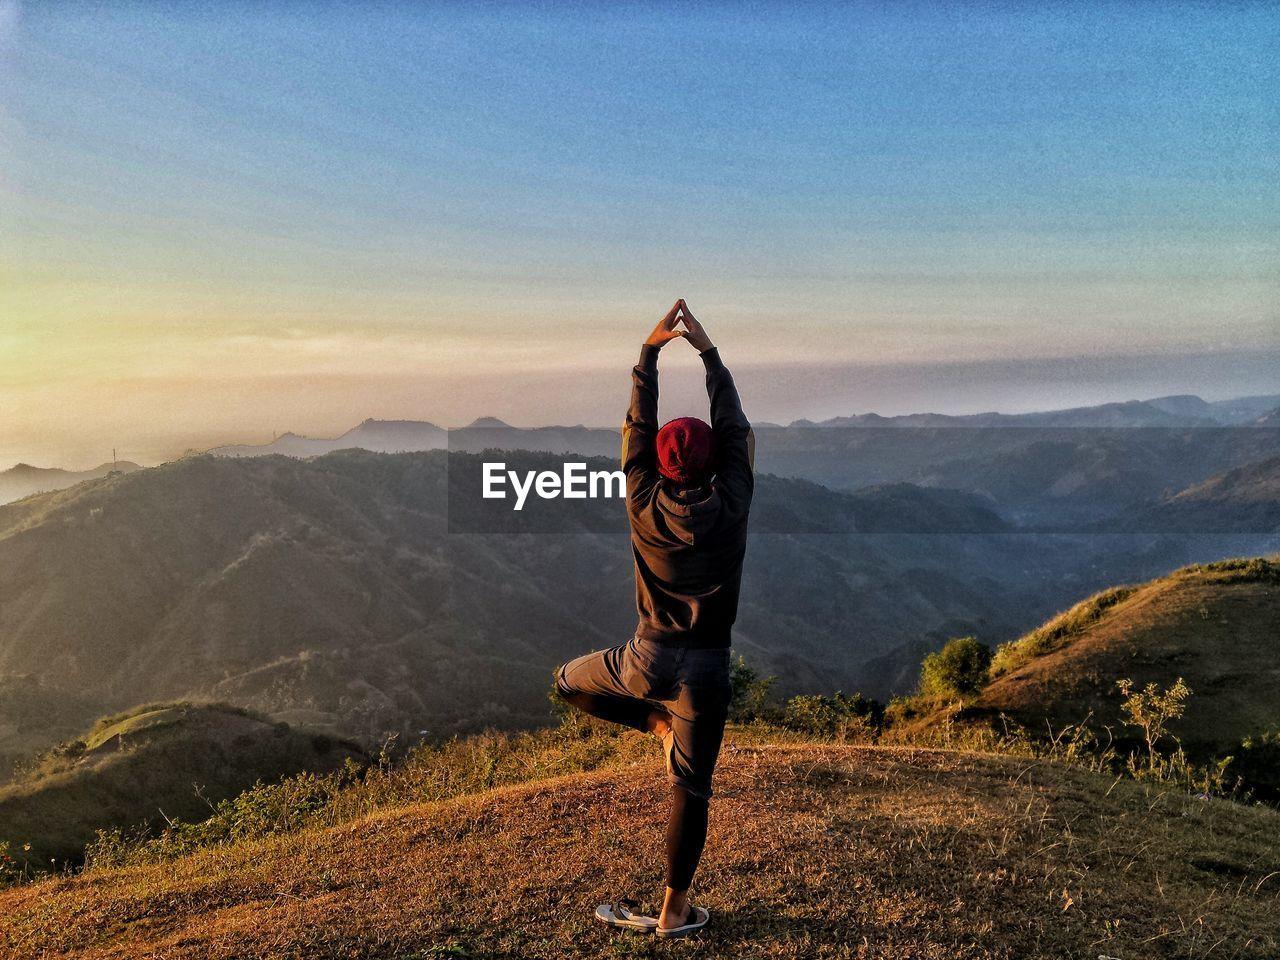 Rear View Of Man Doing Yoga Pose On Mountain